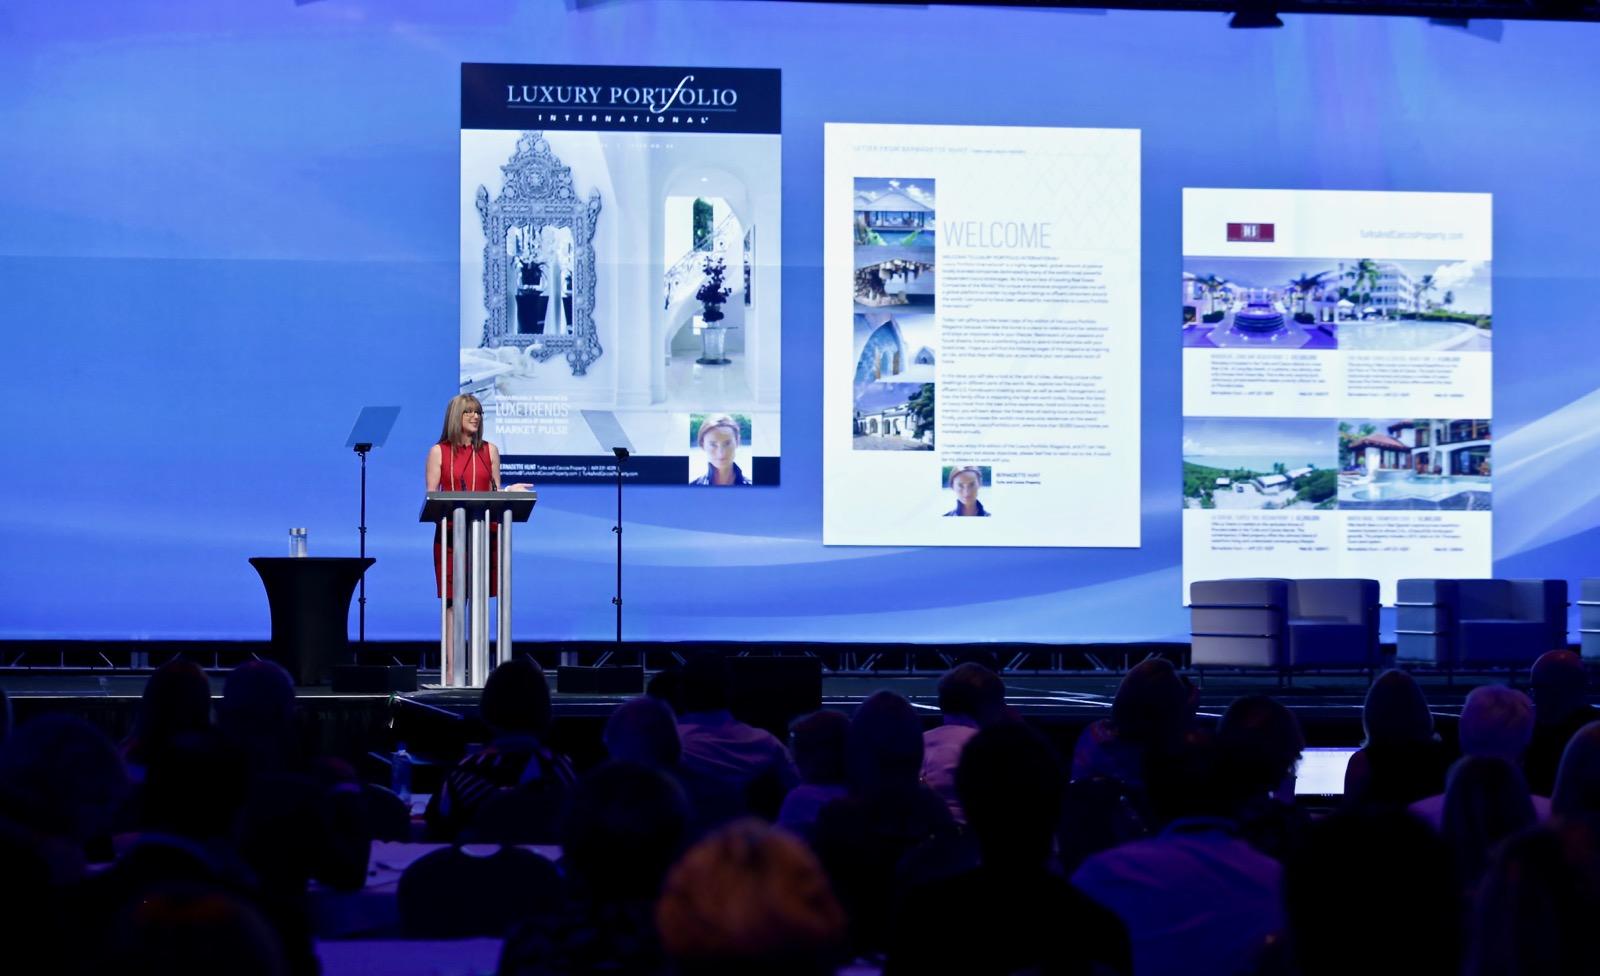 Opening Luxury Portfolio Summit 2017